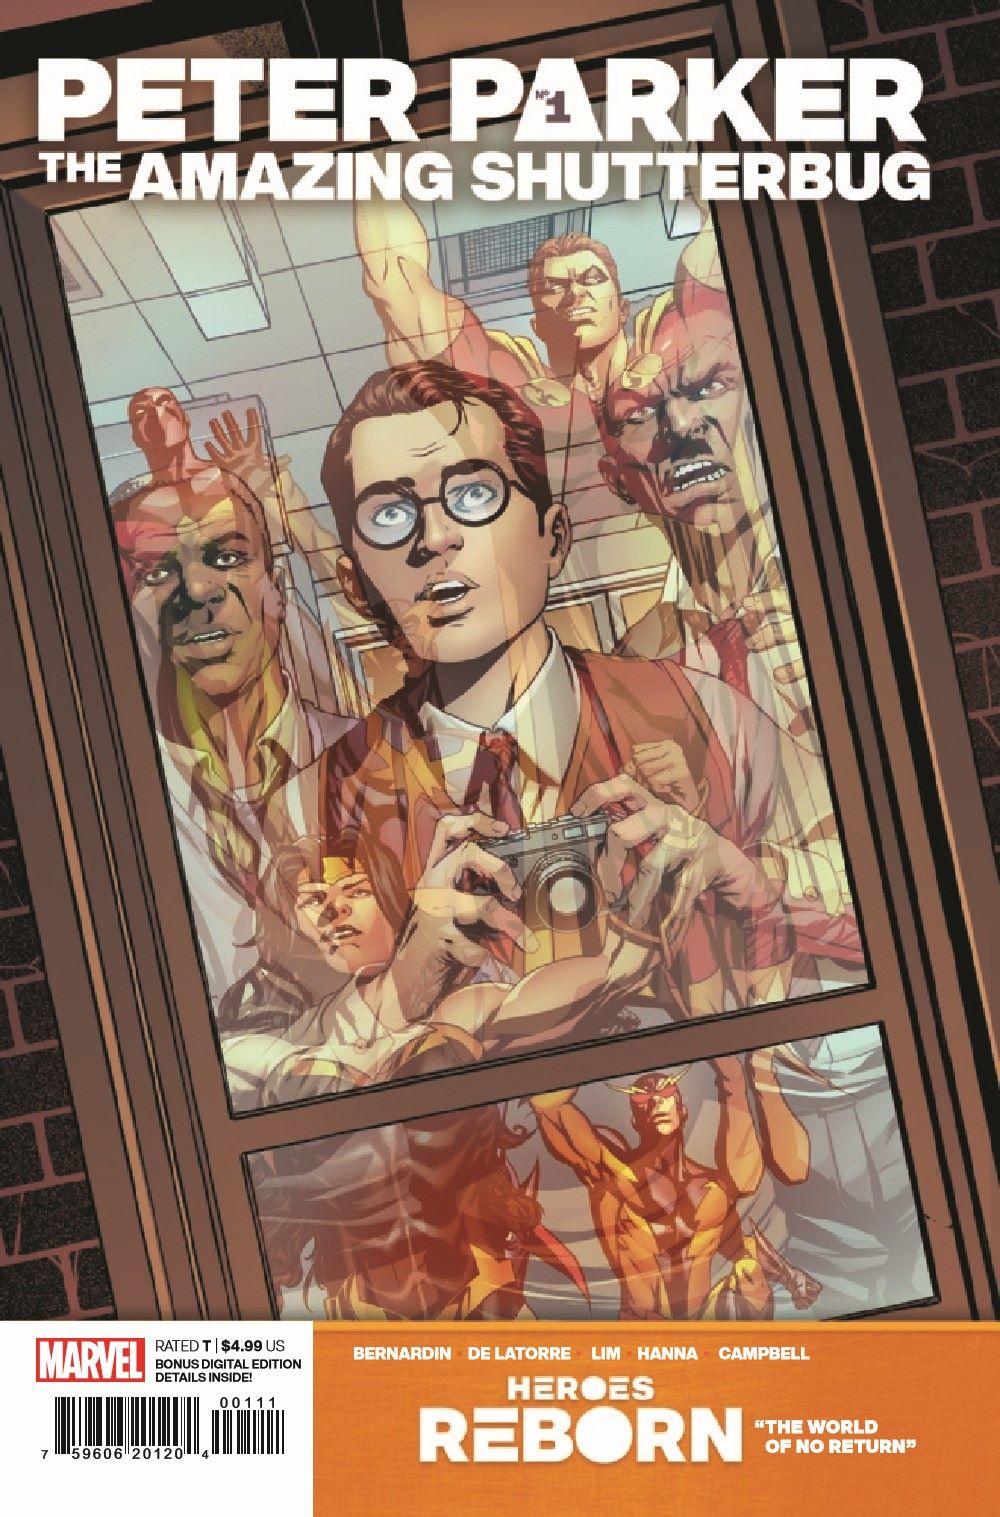 HRPPAMSHUT2021001_Preview-1 ComicList Previews: HEROES REBORN PETER PARKER THE AMAZING SHUTTERBUG #1